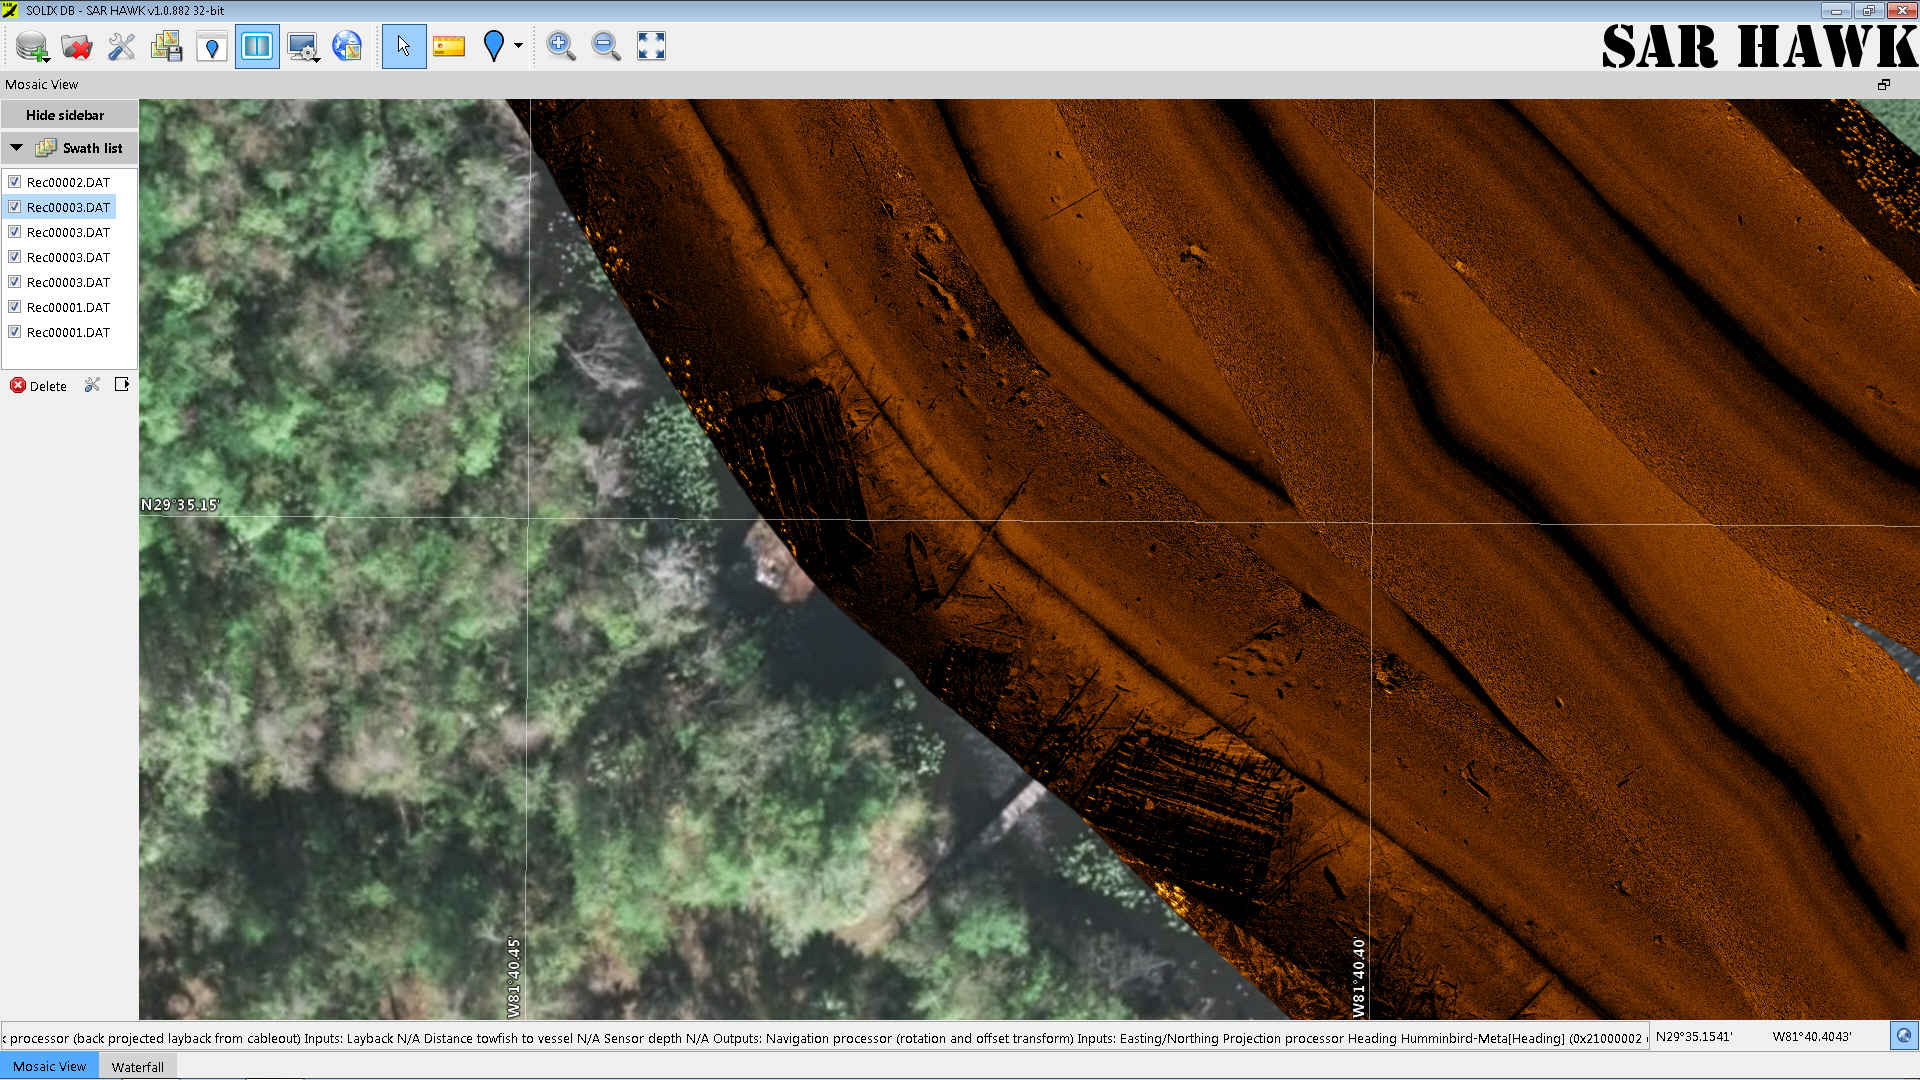 SAR HAWK® Humminbird® Sonar Target Acquisition Software – Black